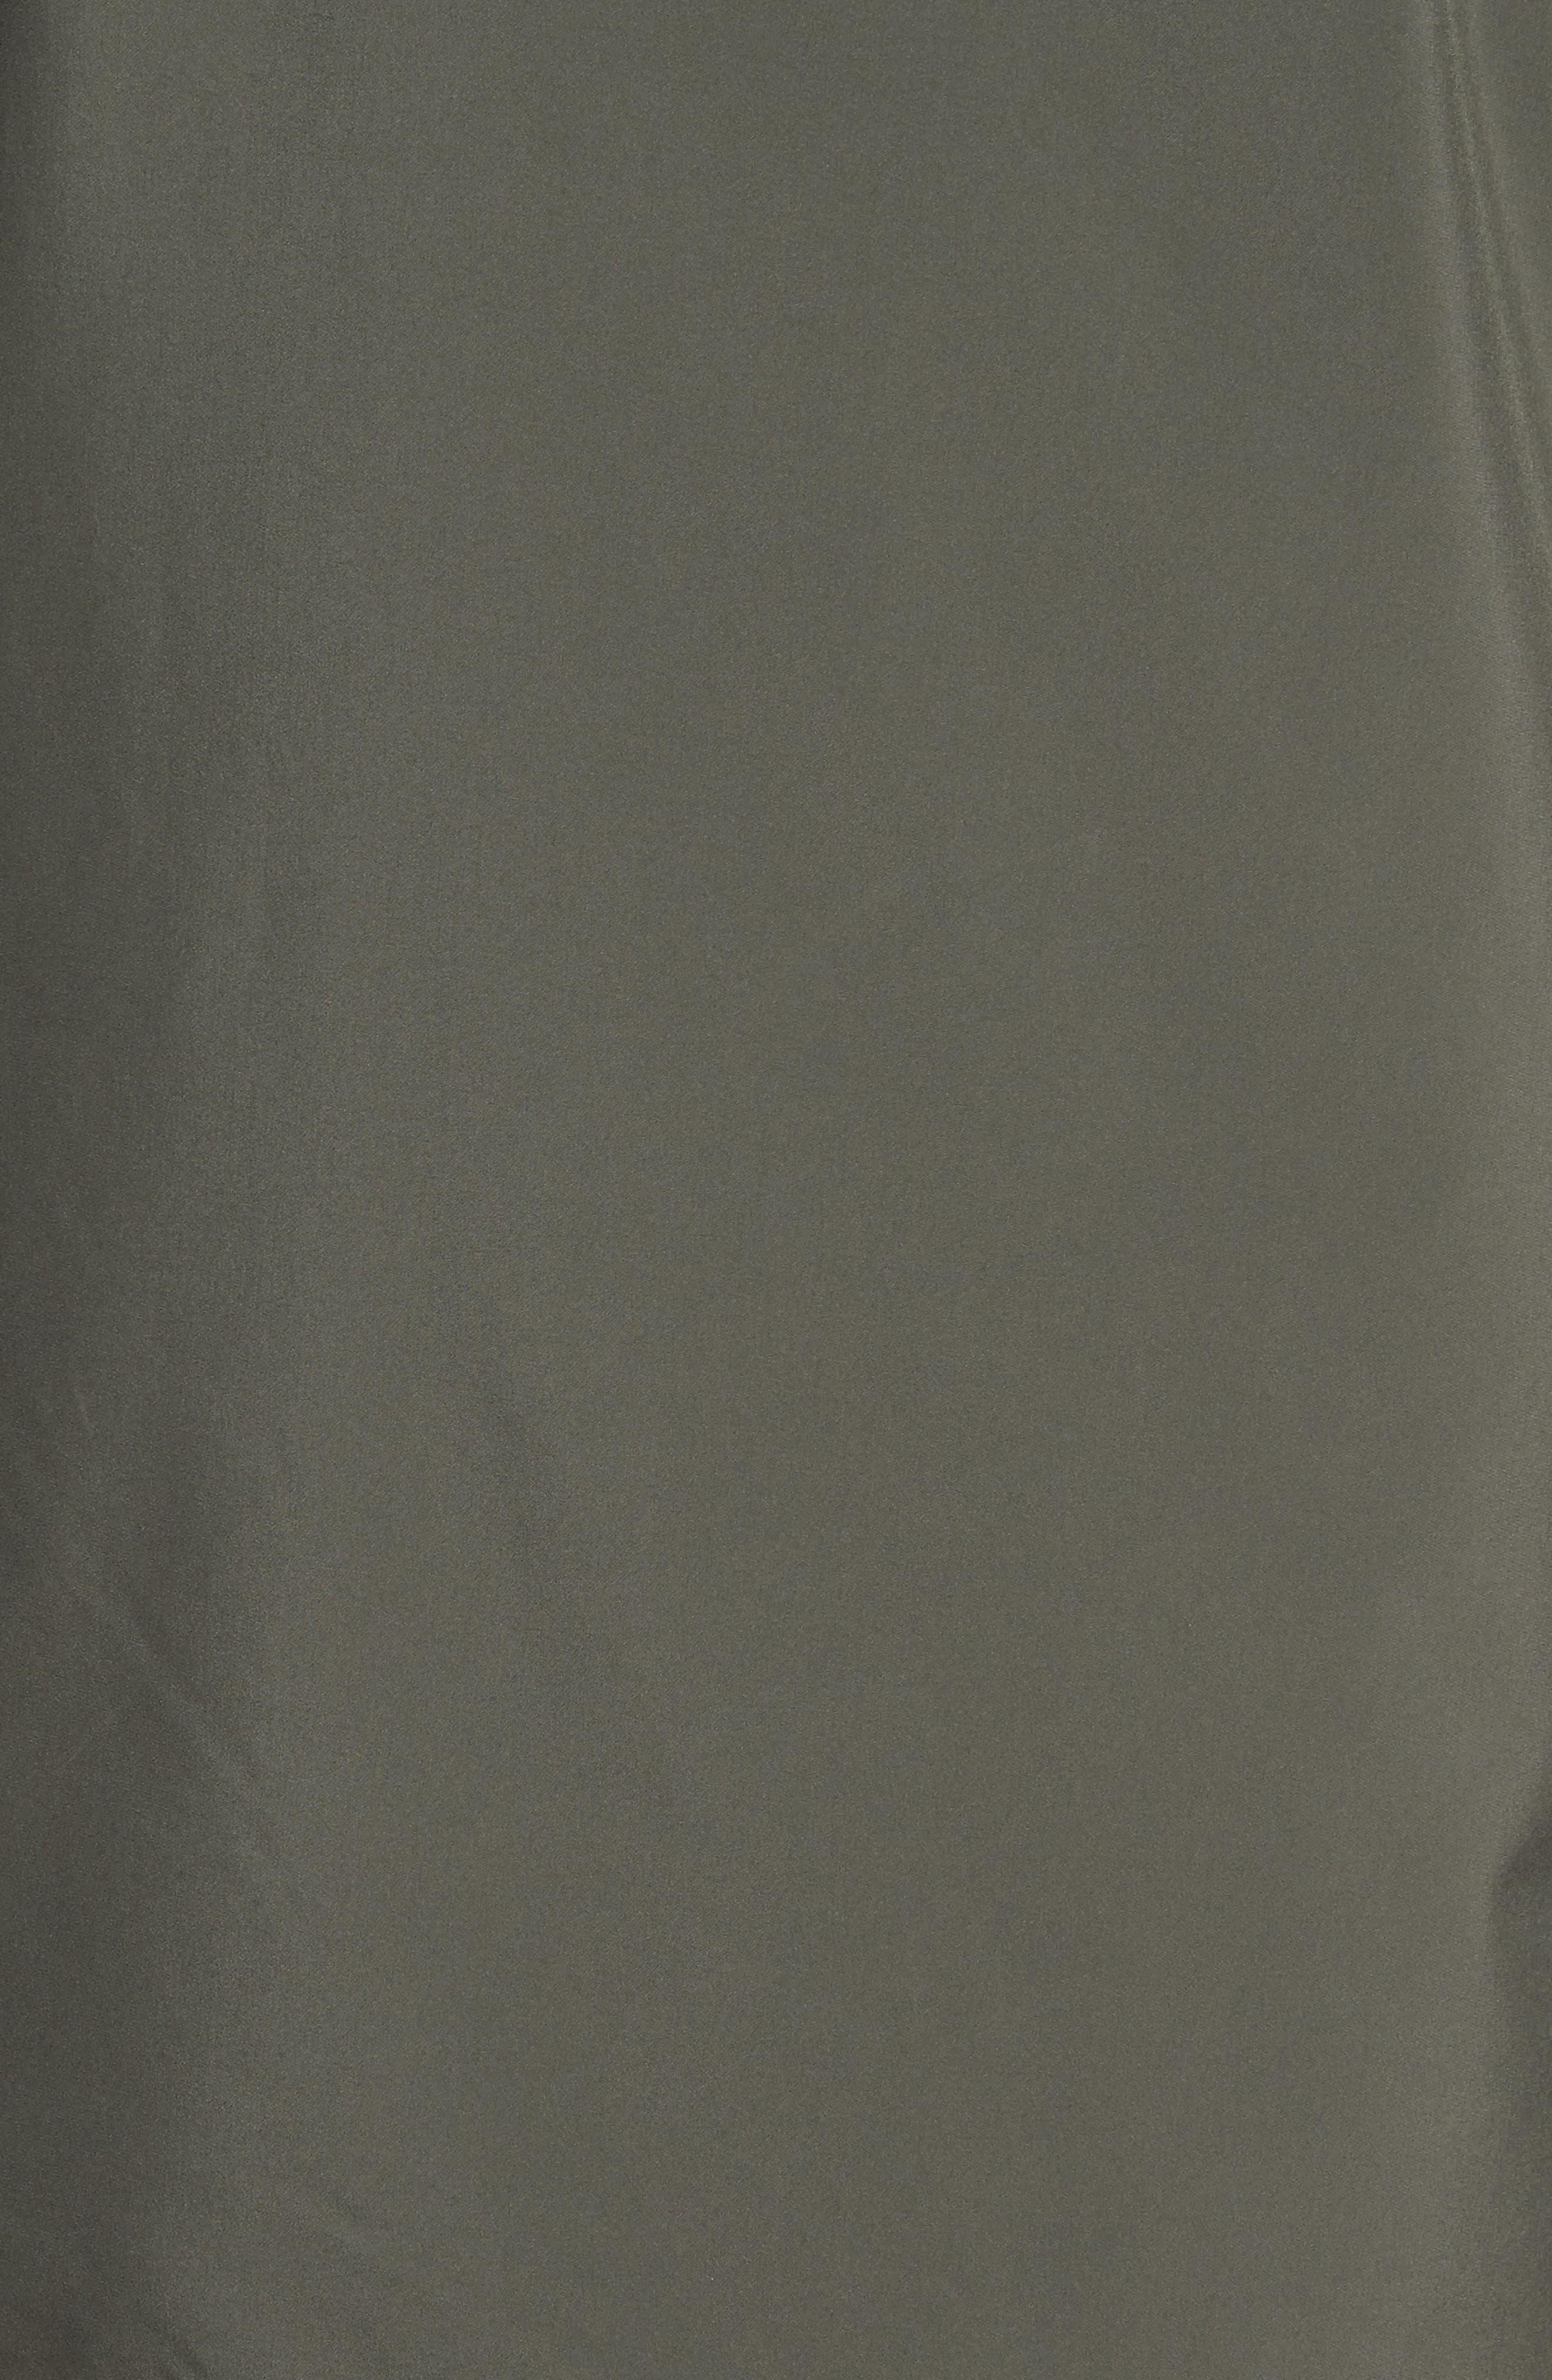 & Bros. Navigator Field Jacket,                             Alternate thumbnail 5, color,                             Grape Leaf